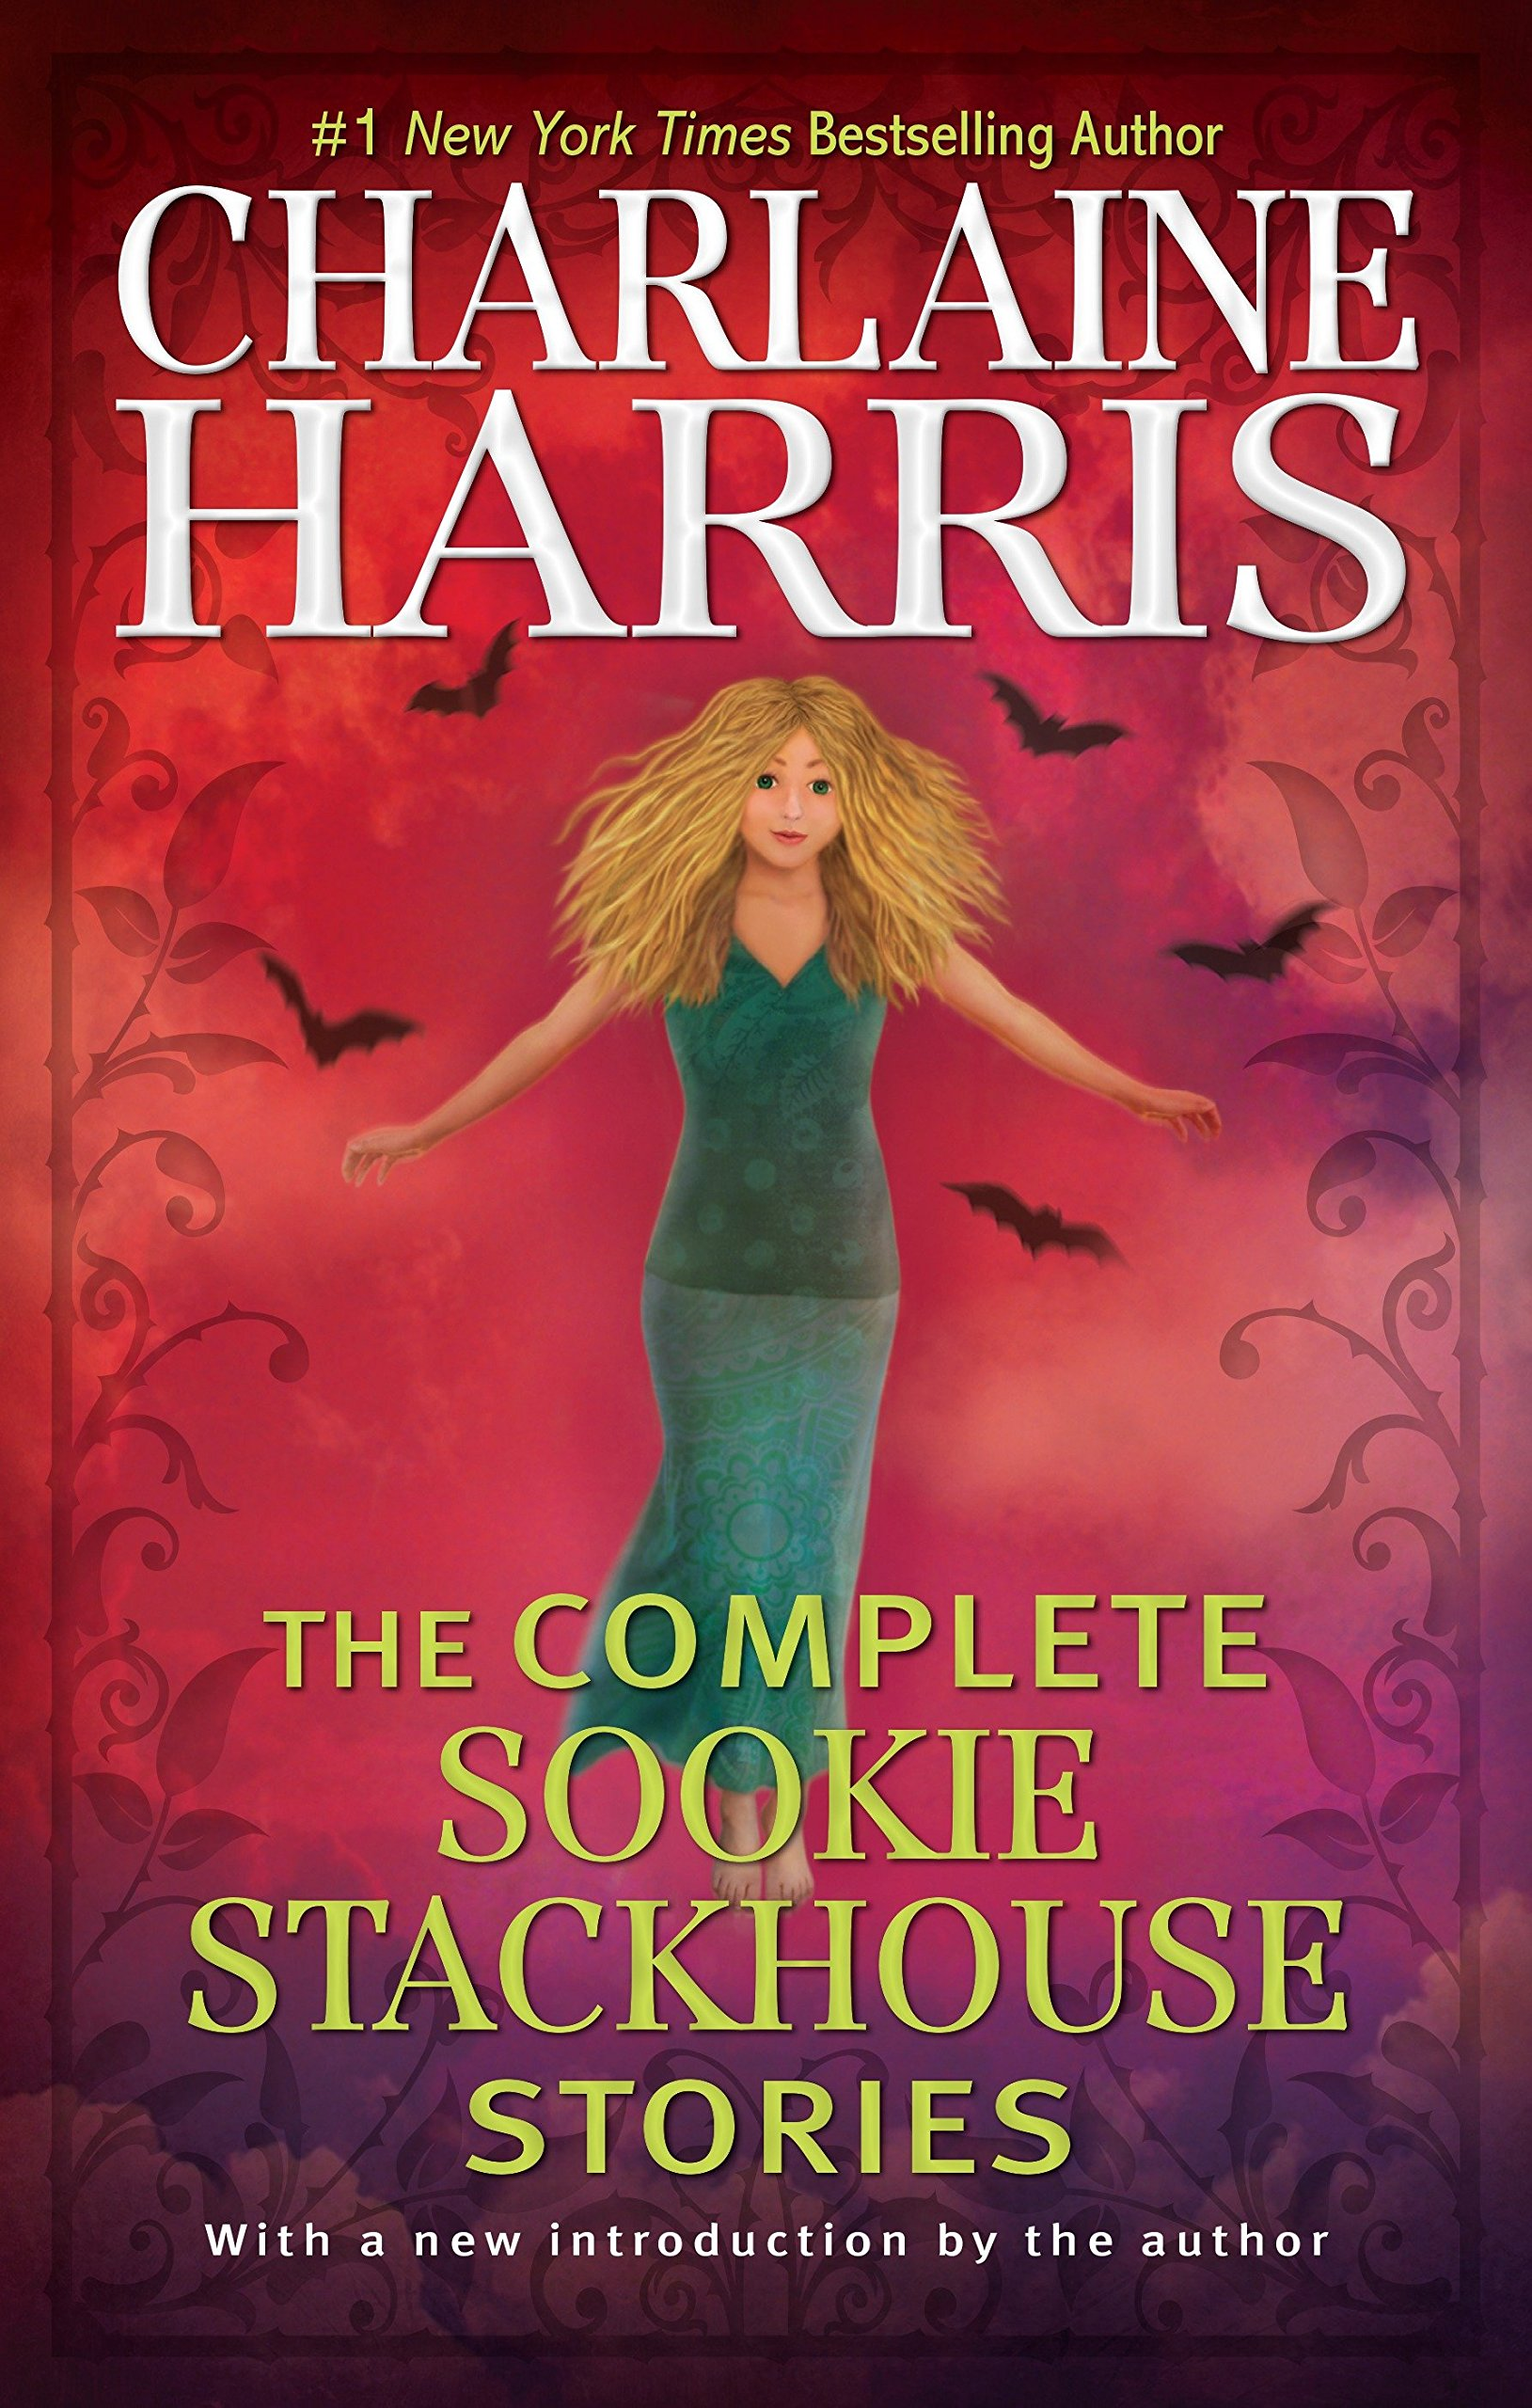 charlaine harris sookie stackhouse series free download